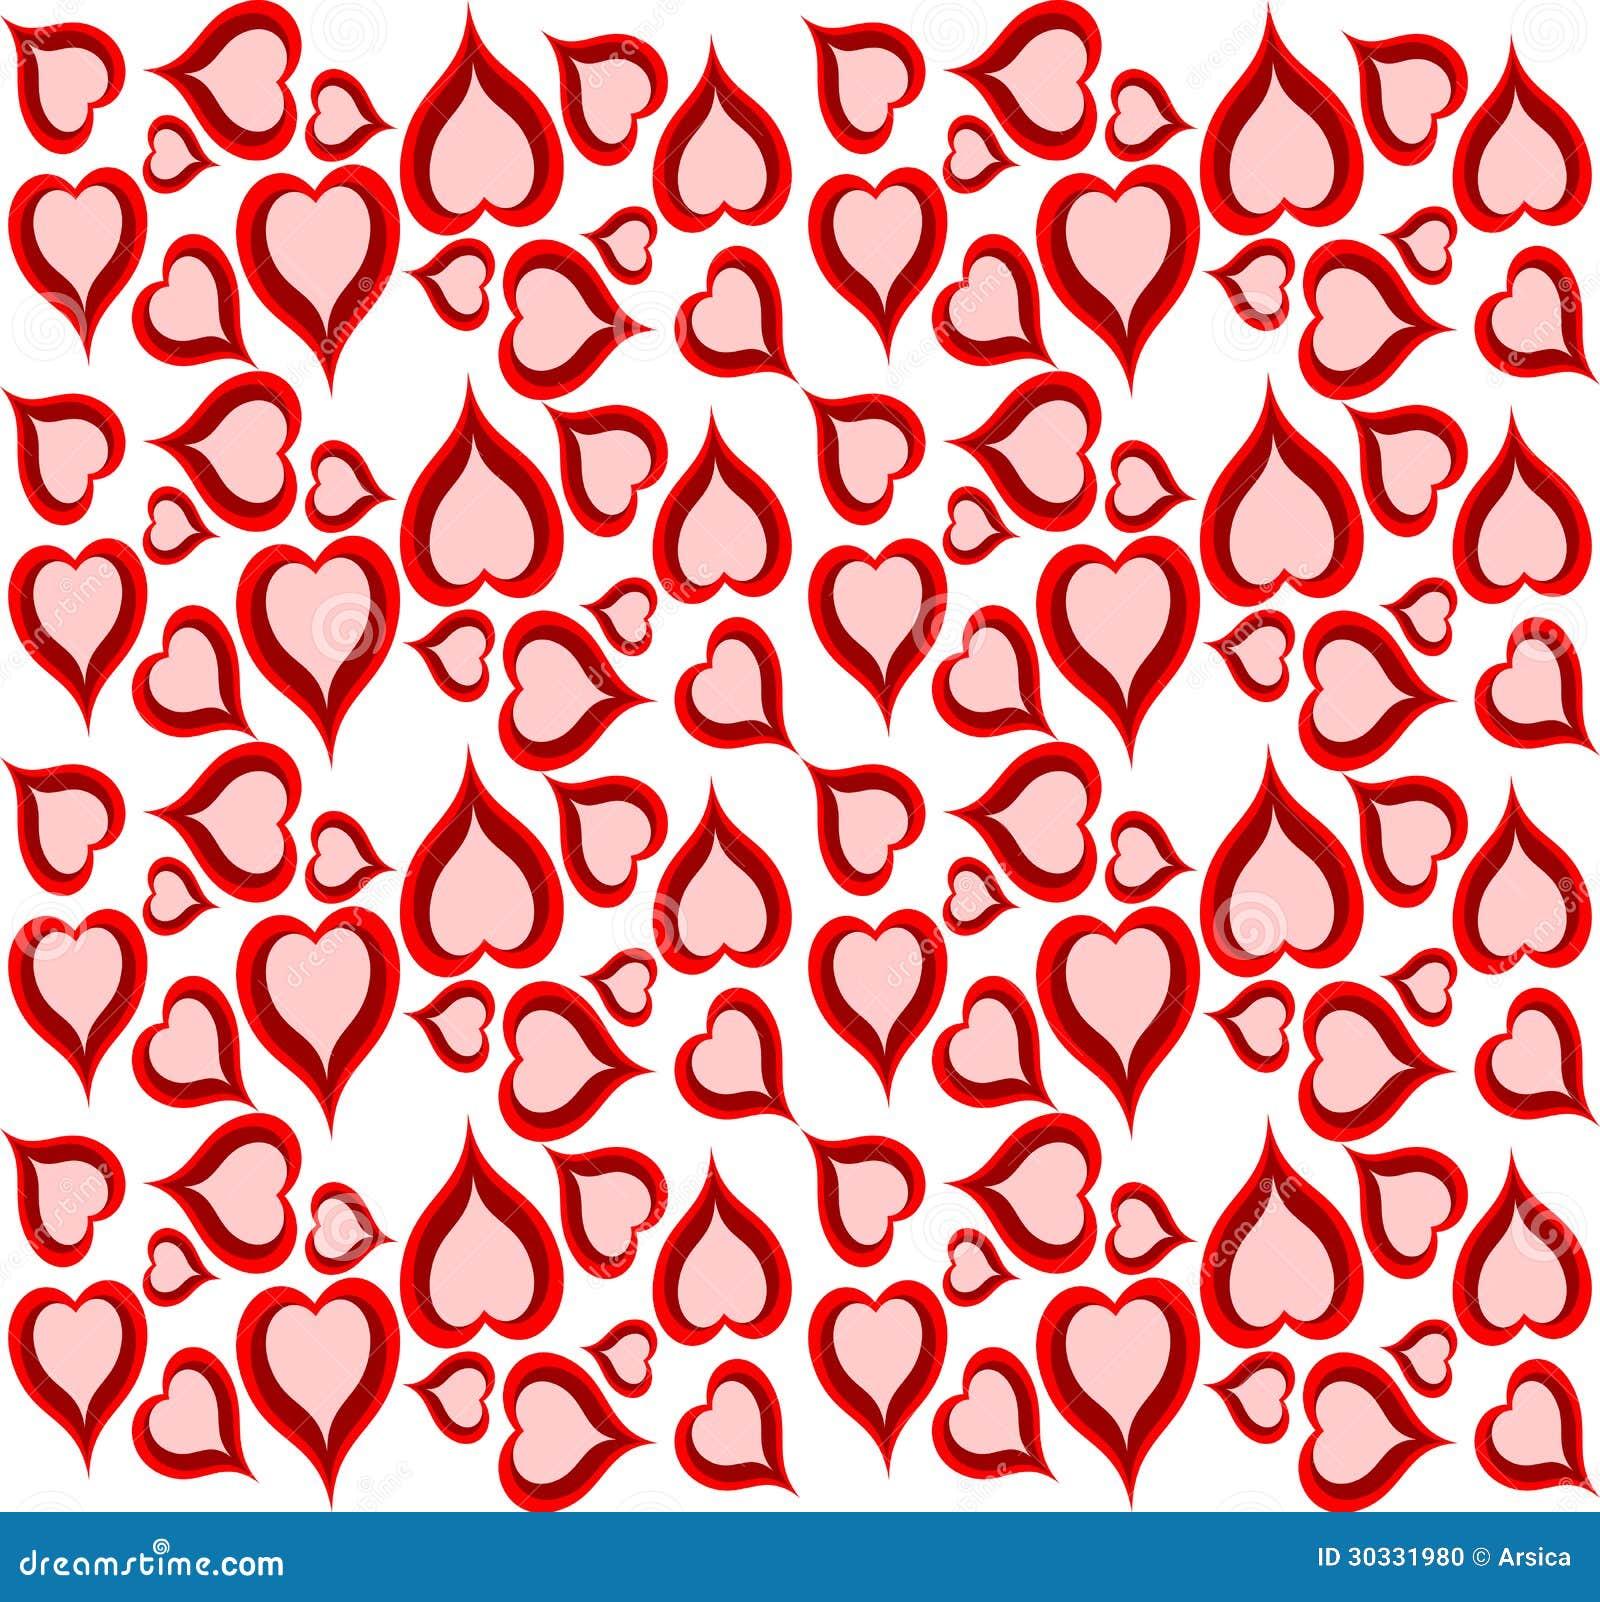 Cute Retro Design Background Of Hearts Stock Photo Image